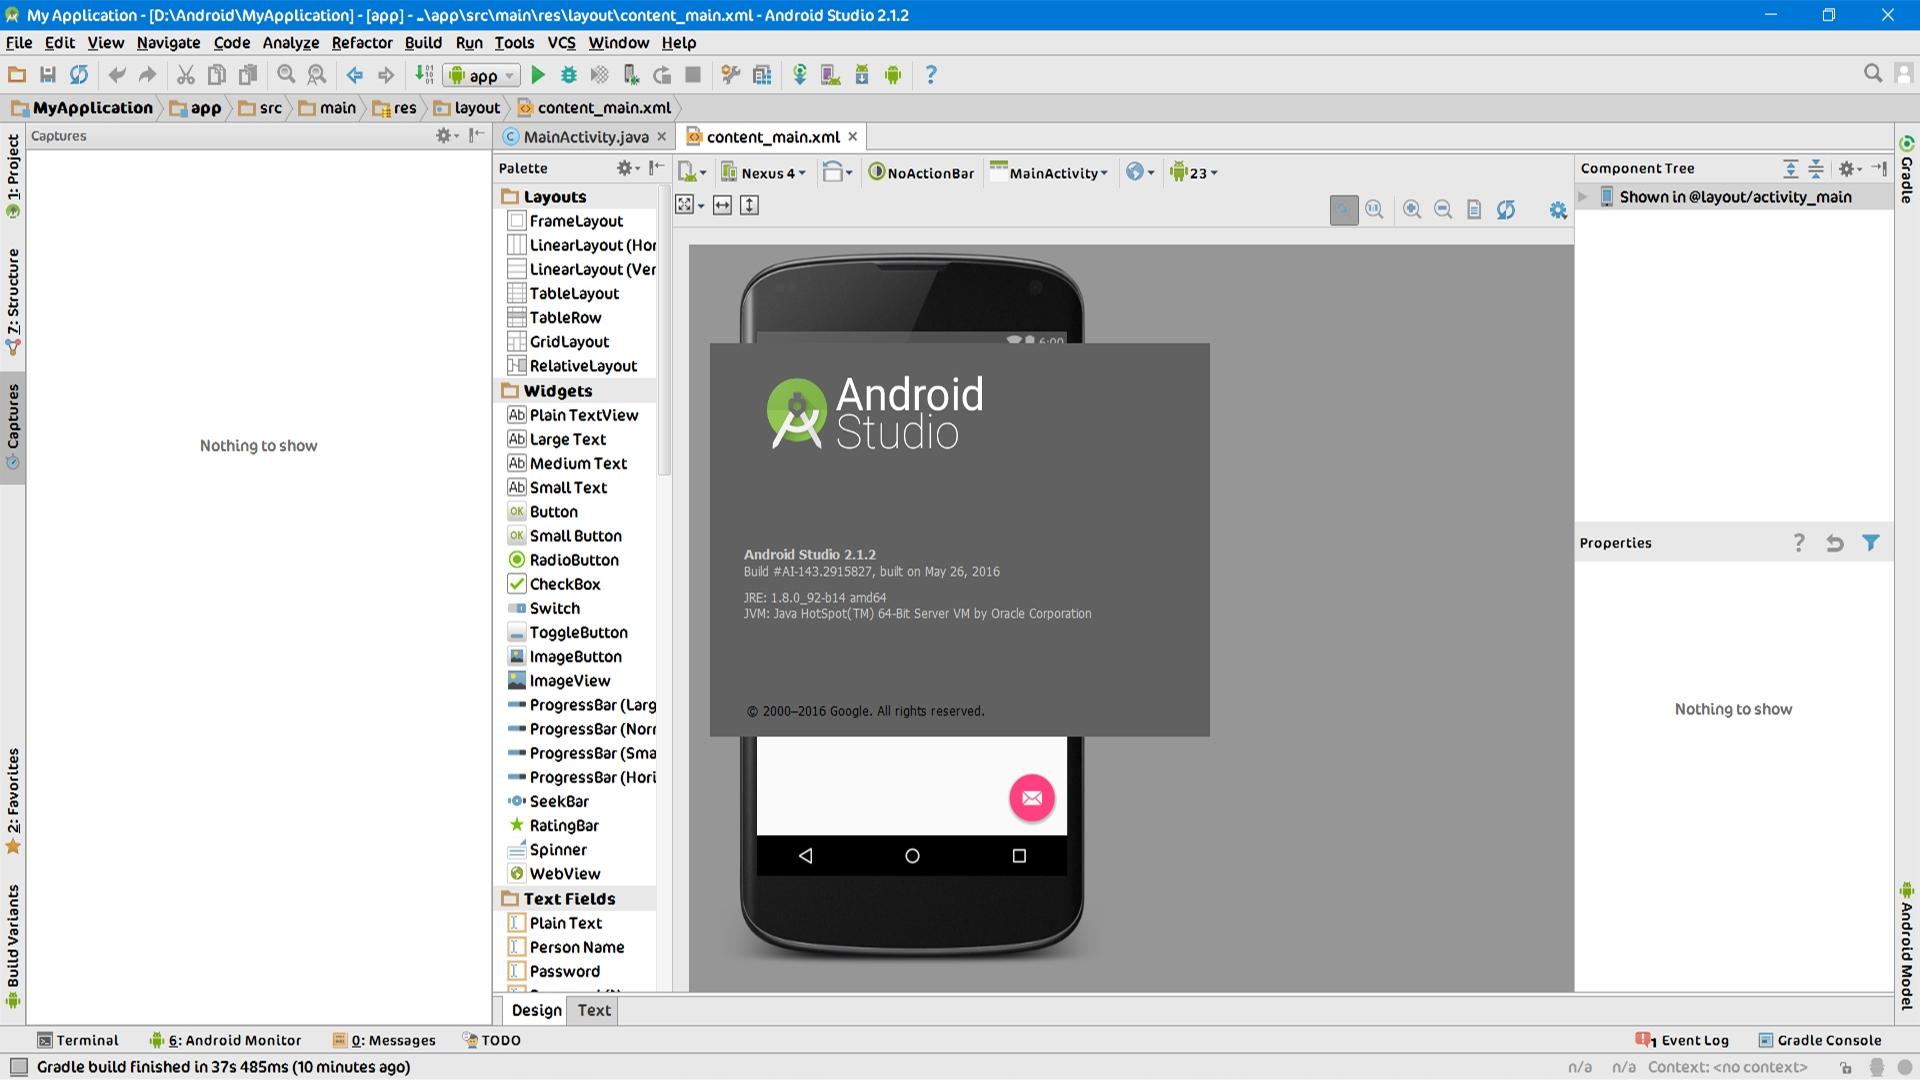 Скачать Праграму Android